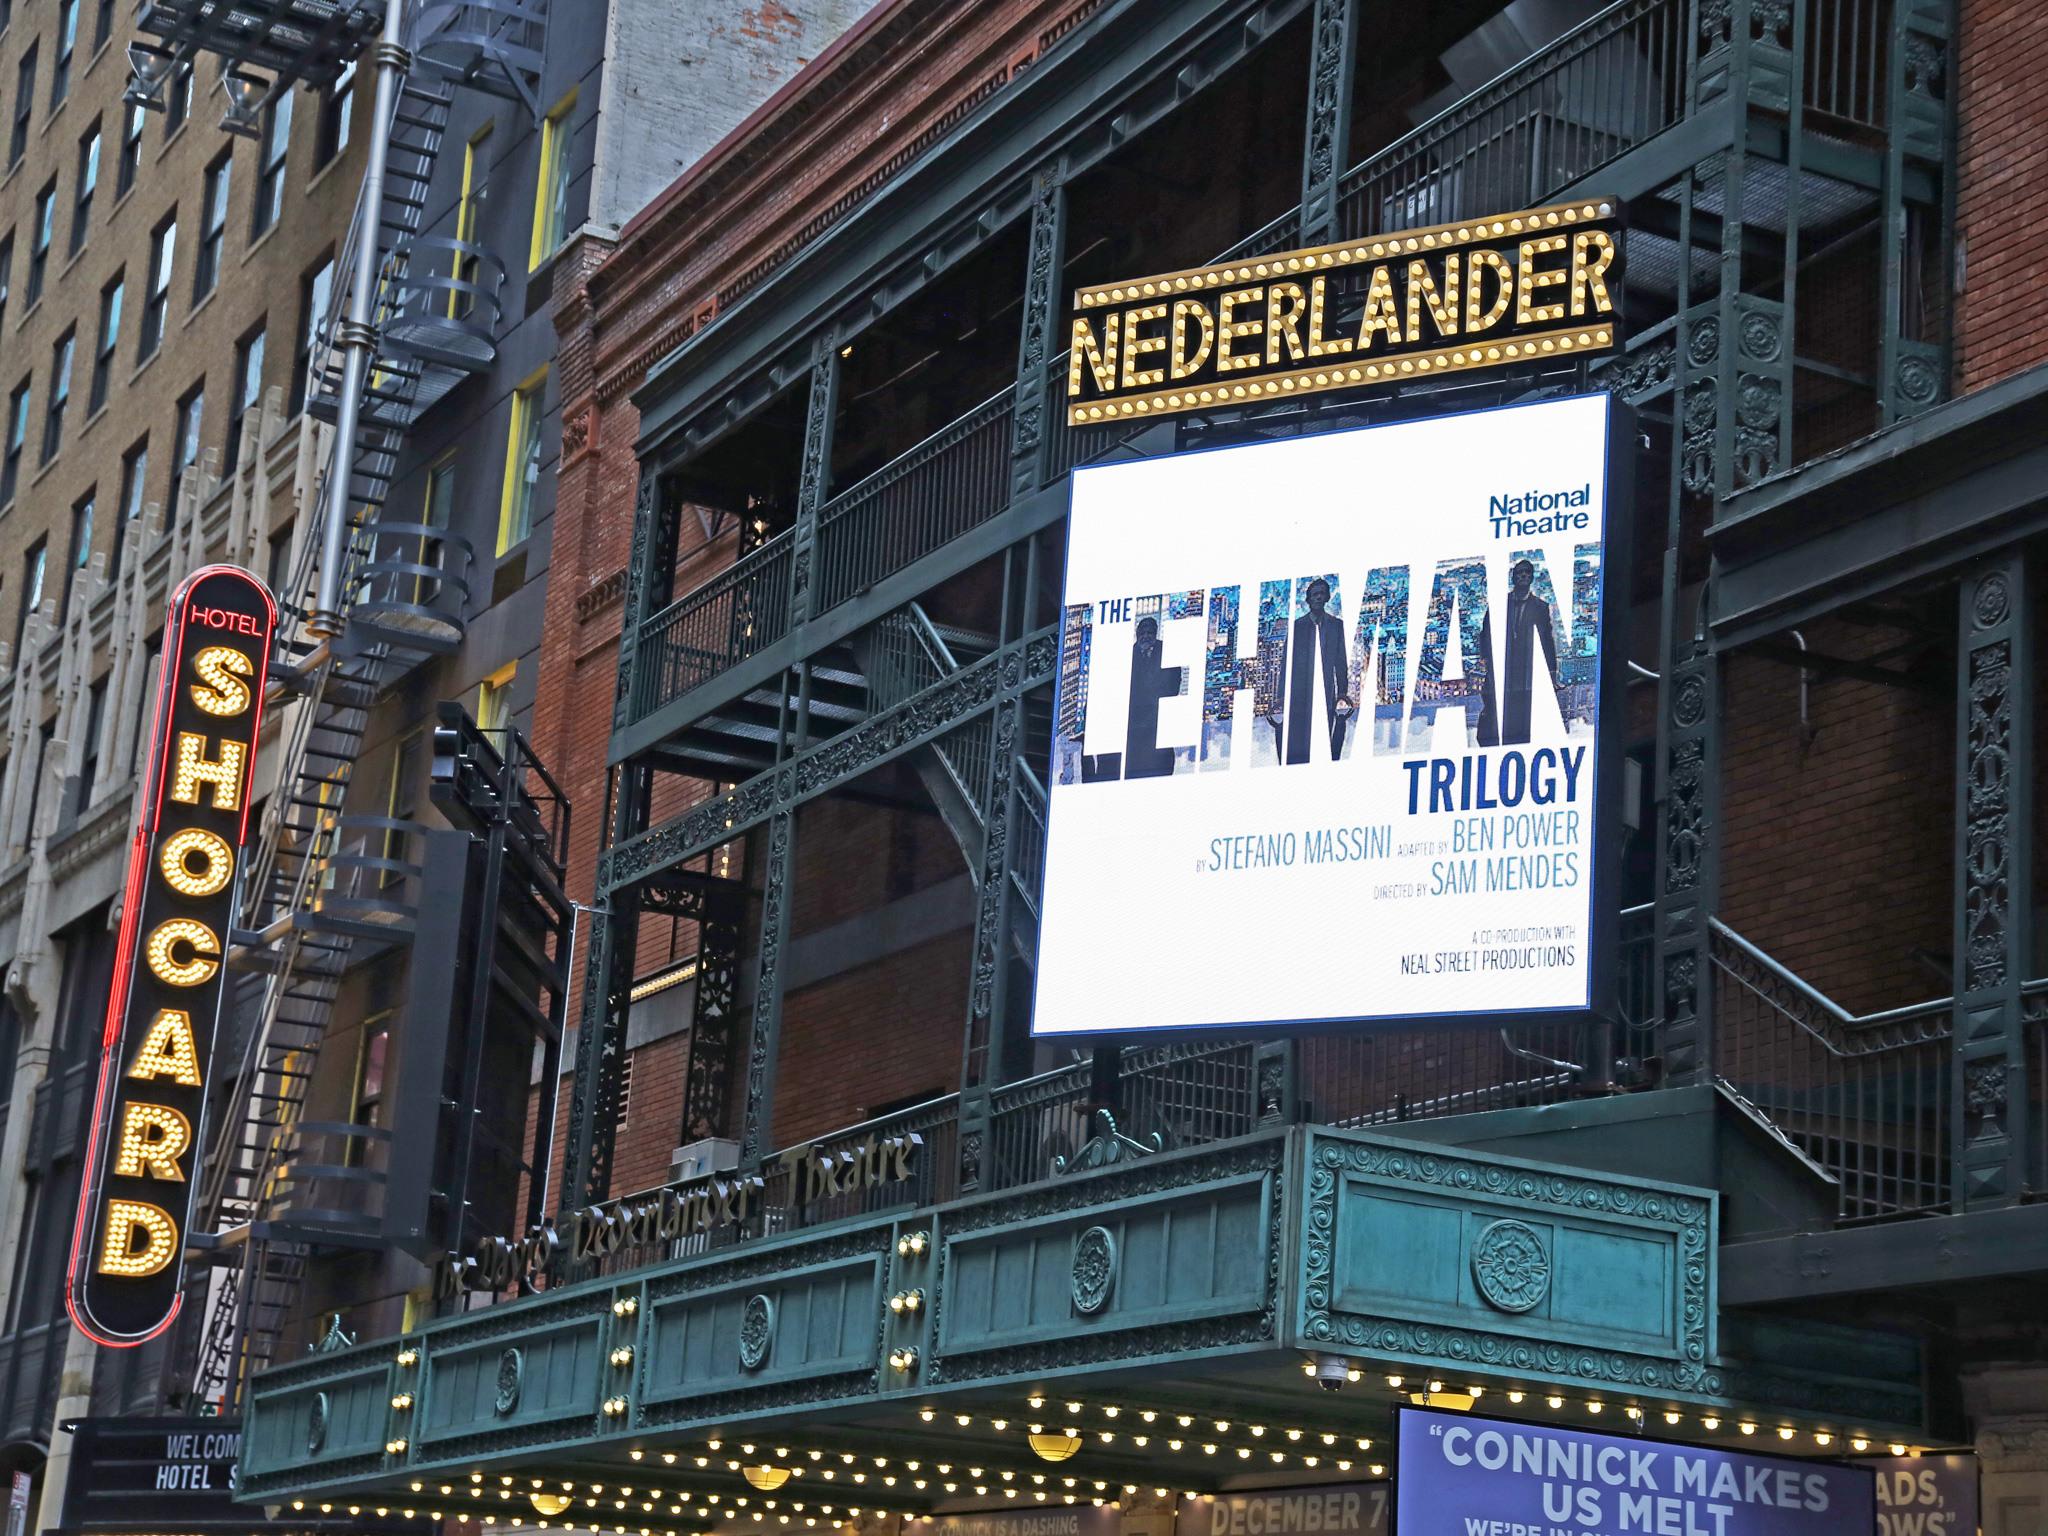 The Lehman Trilogy at the Nederlander Theatre